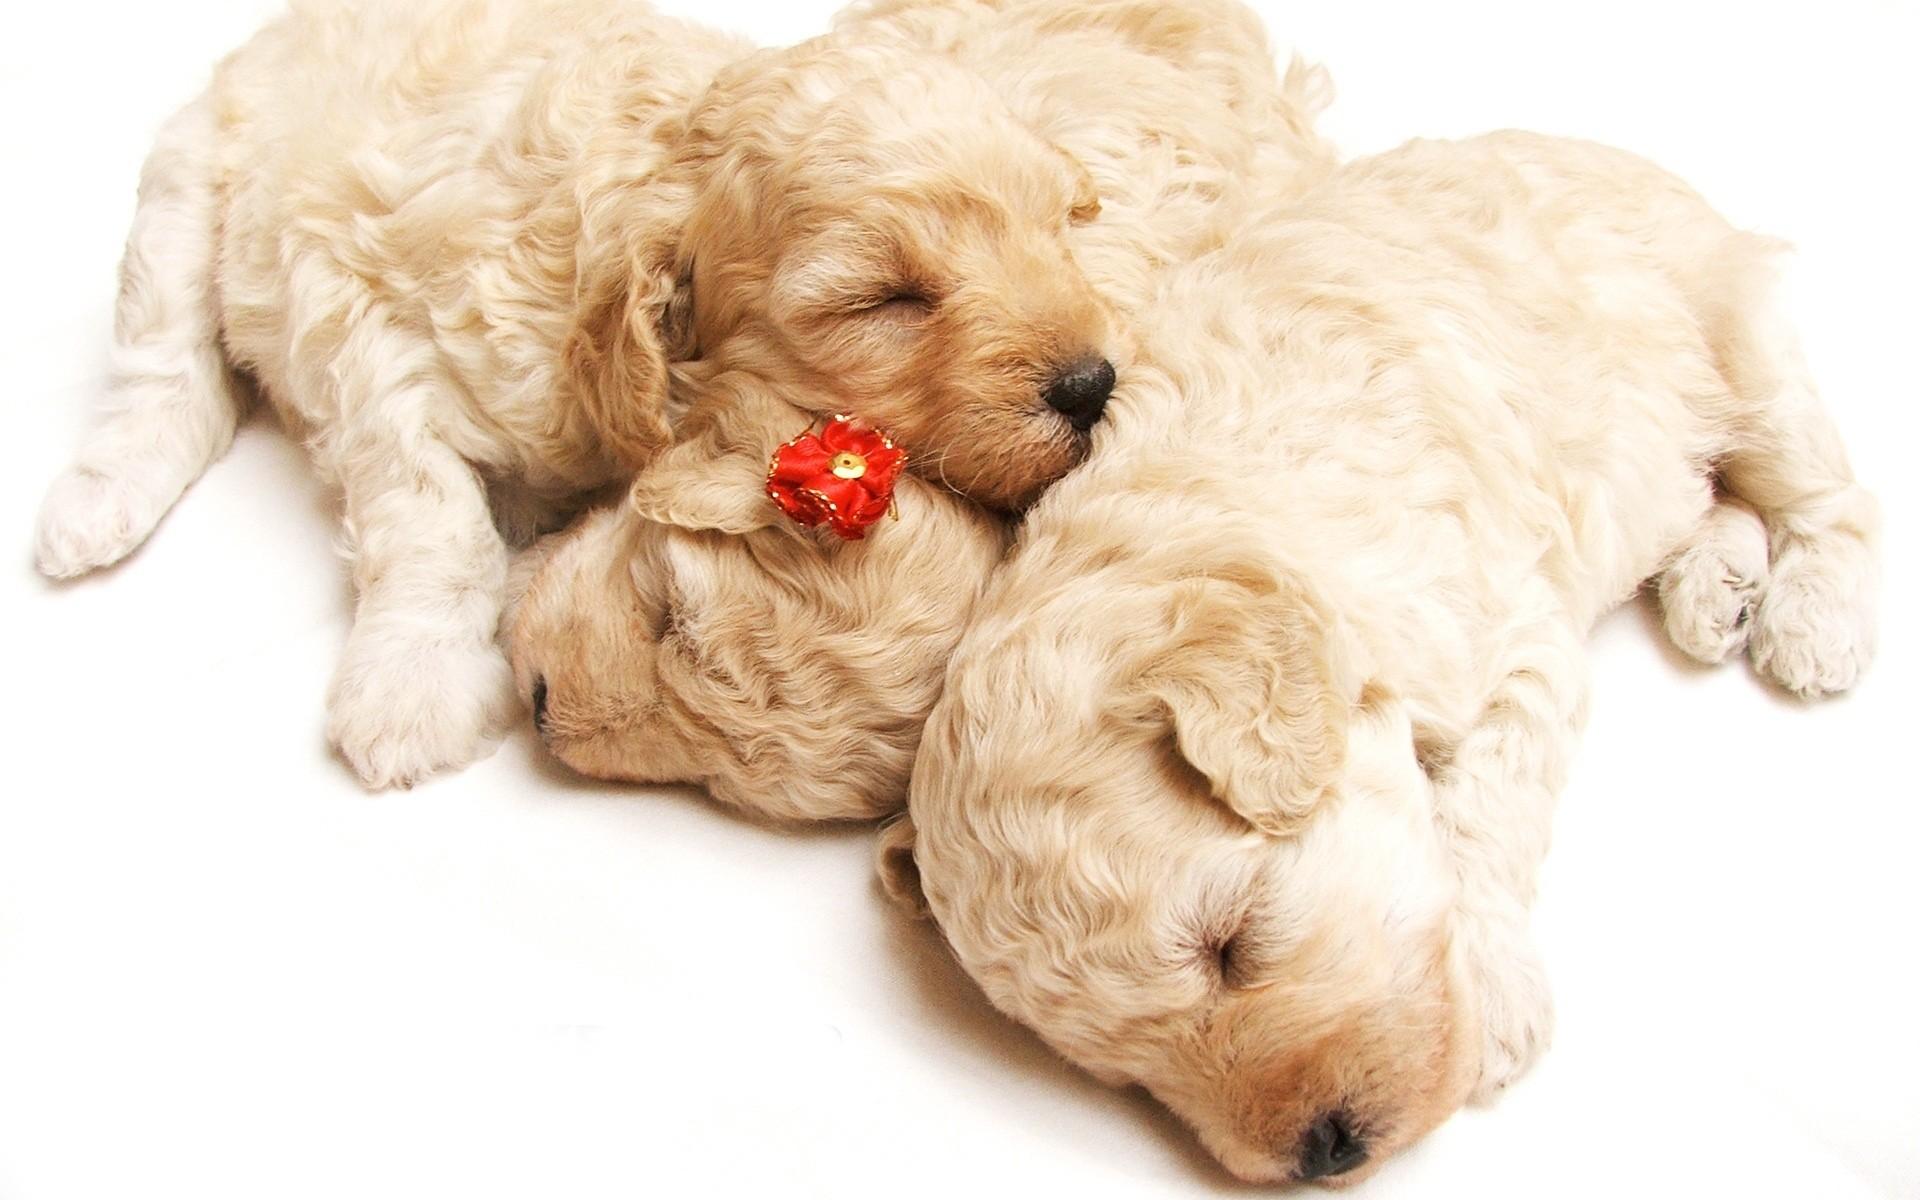 Image for cute sleeping puppies animal hd wallpaper